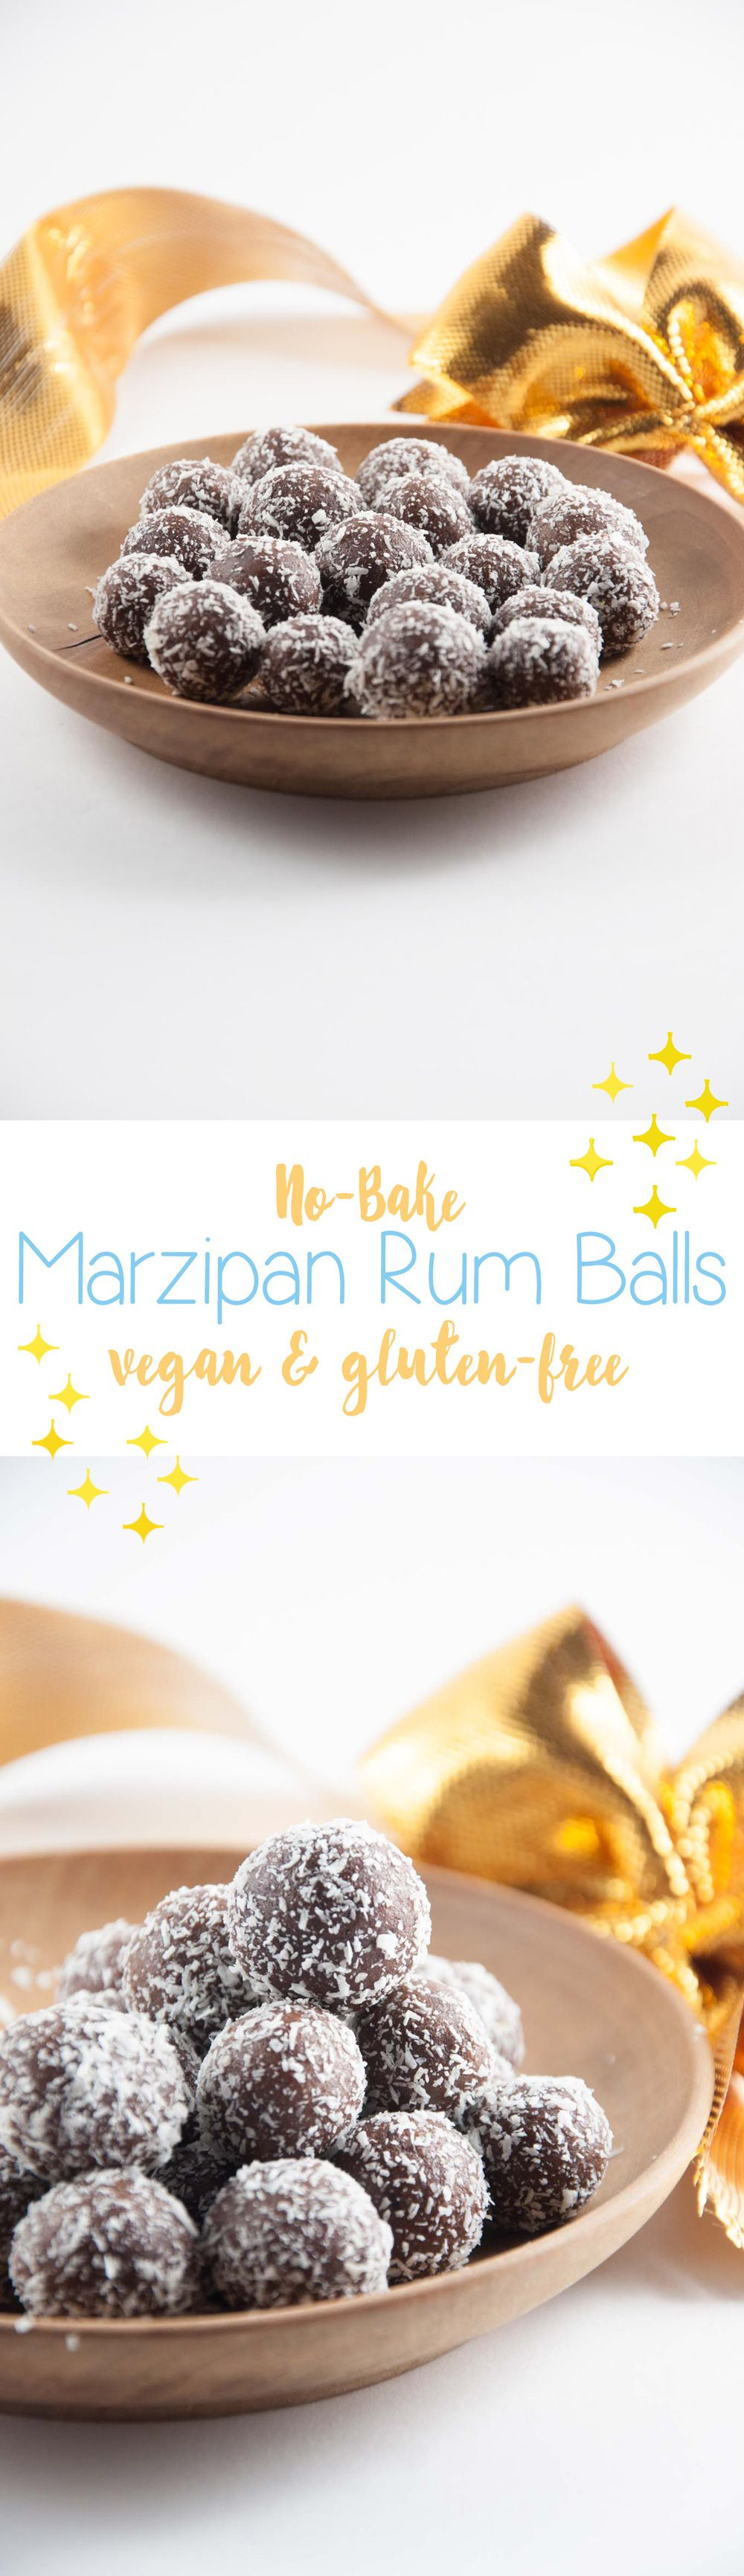 No-Bake Marzipan Rum Balls   ElephantasticVegan.com